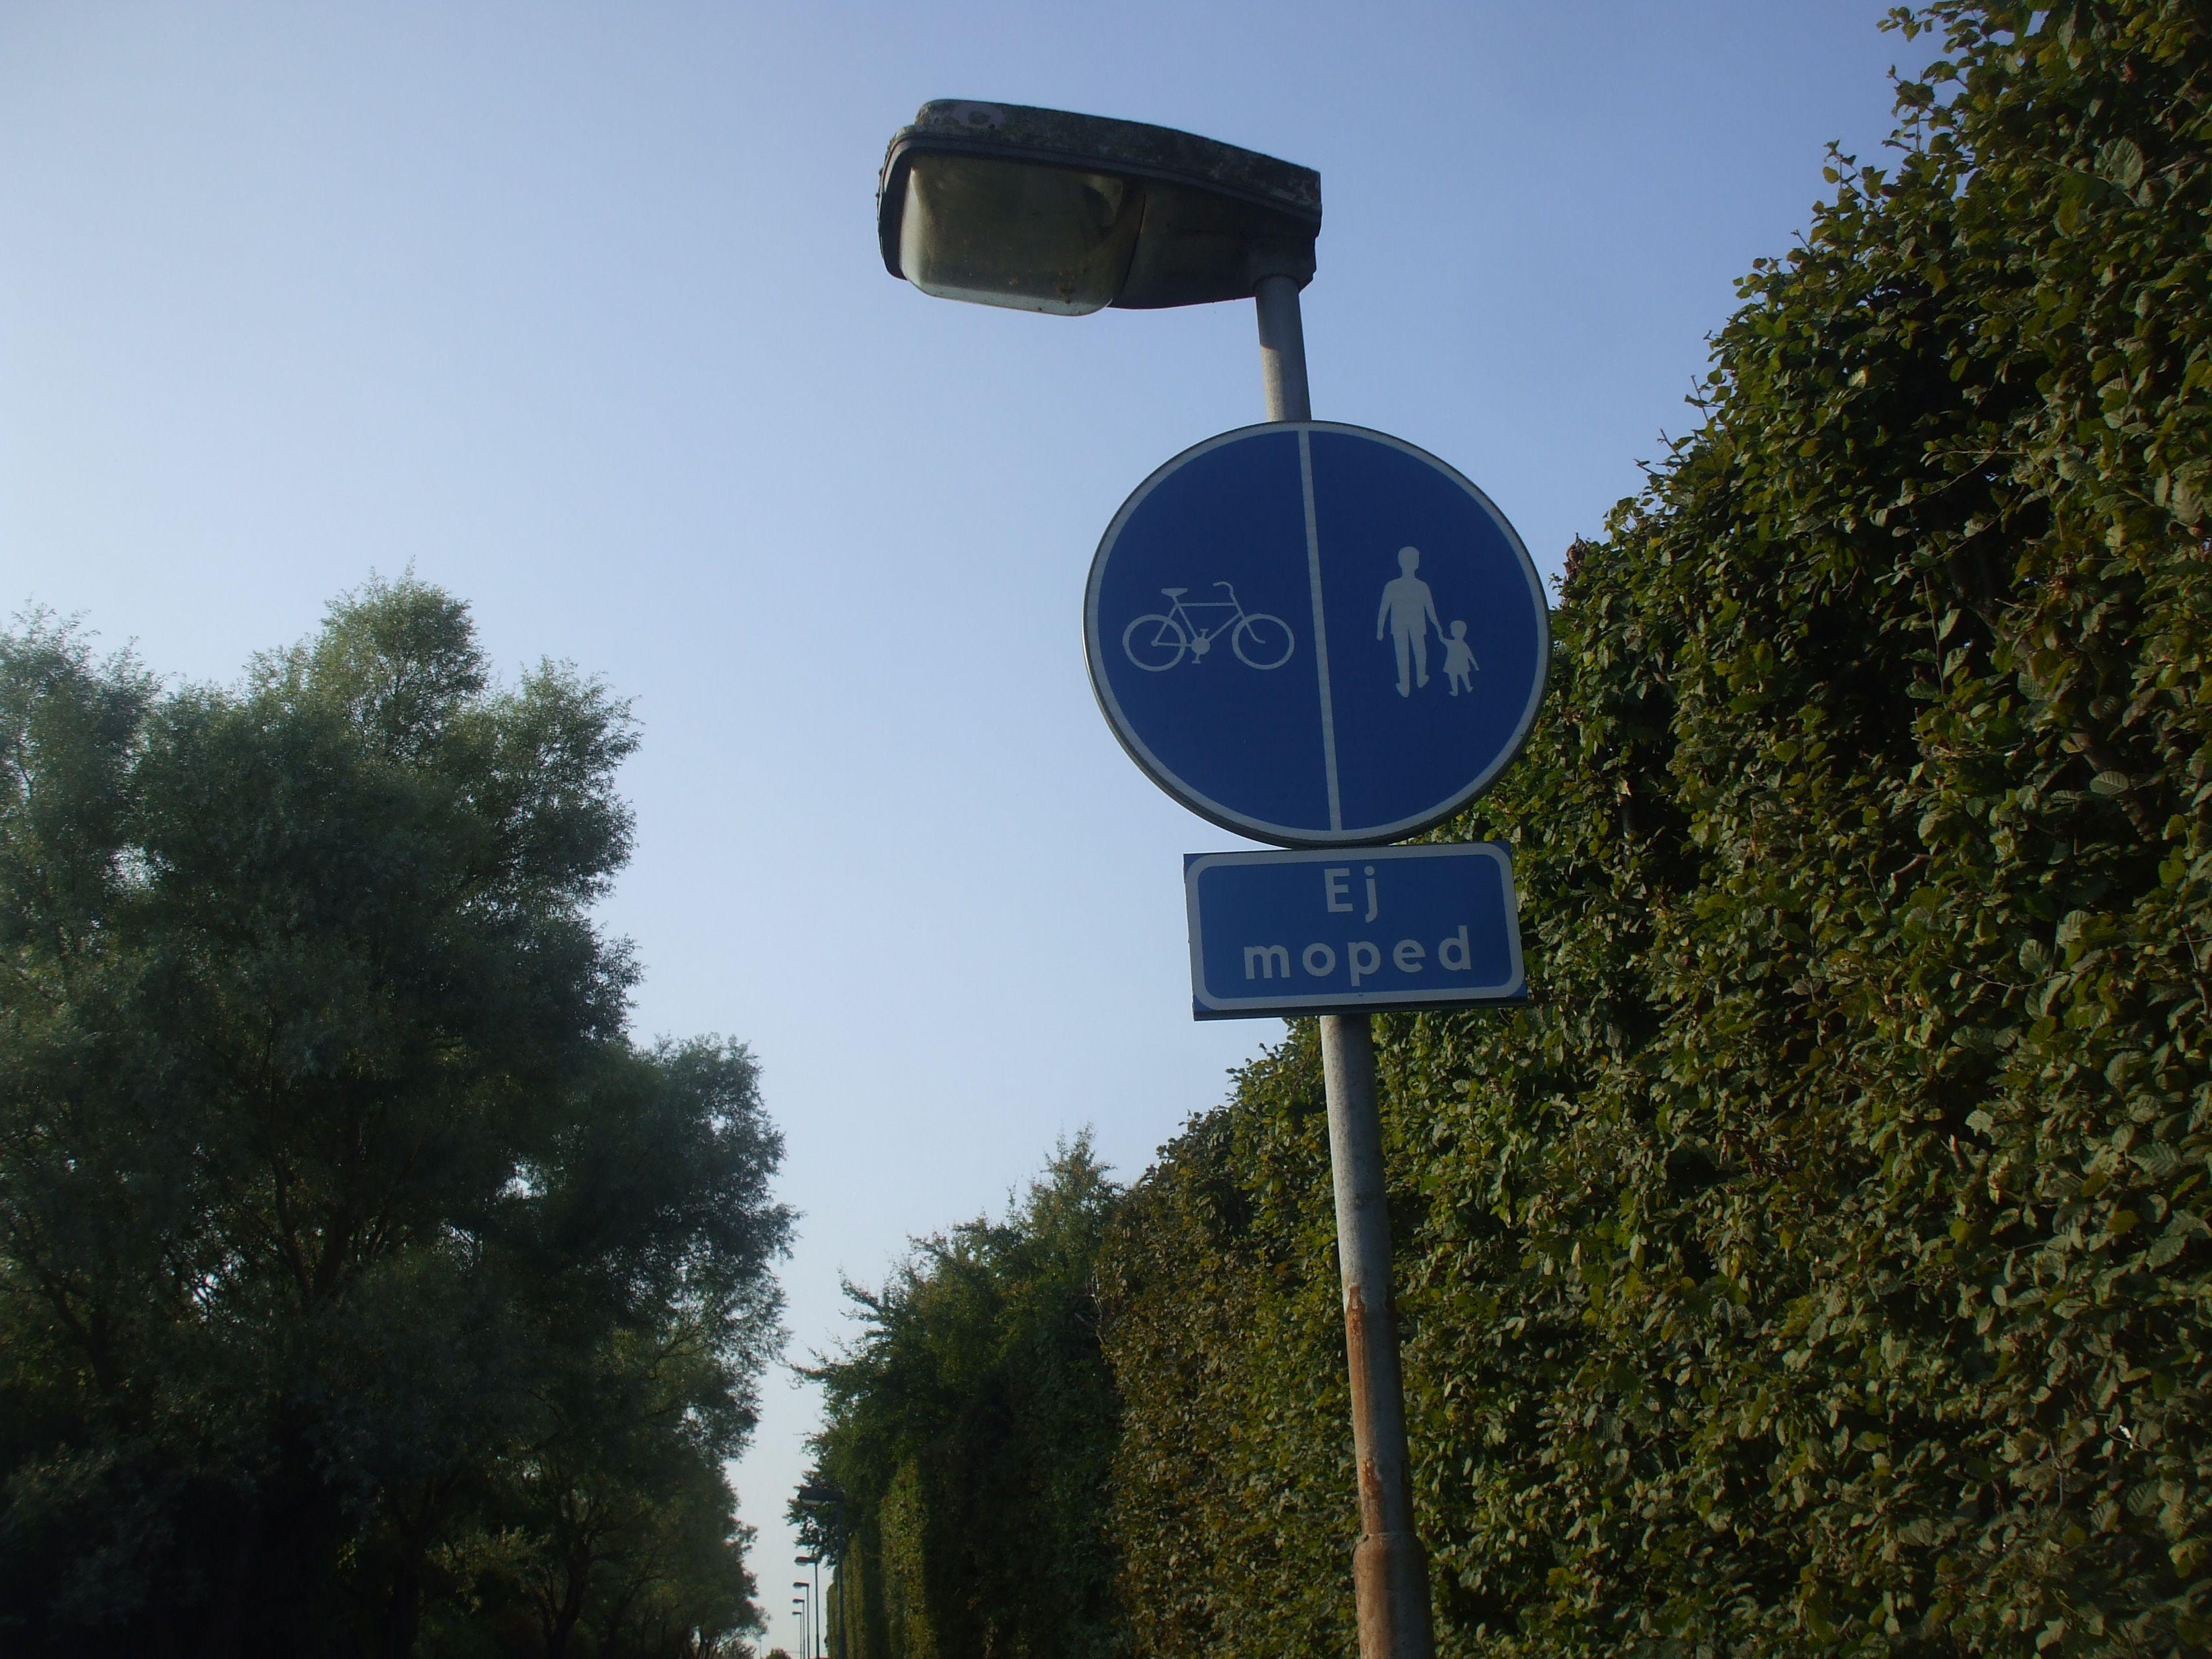 Bisiklet-Yaya yolu, Malmö